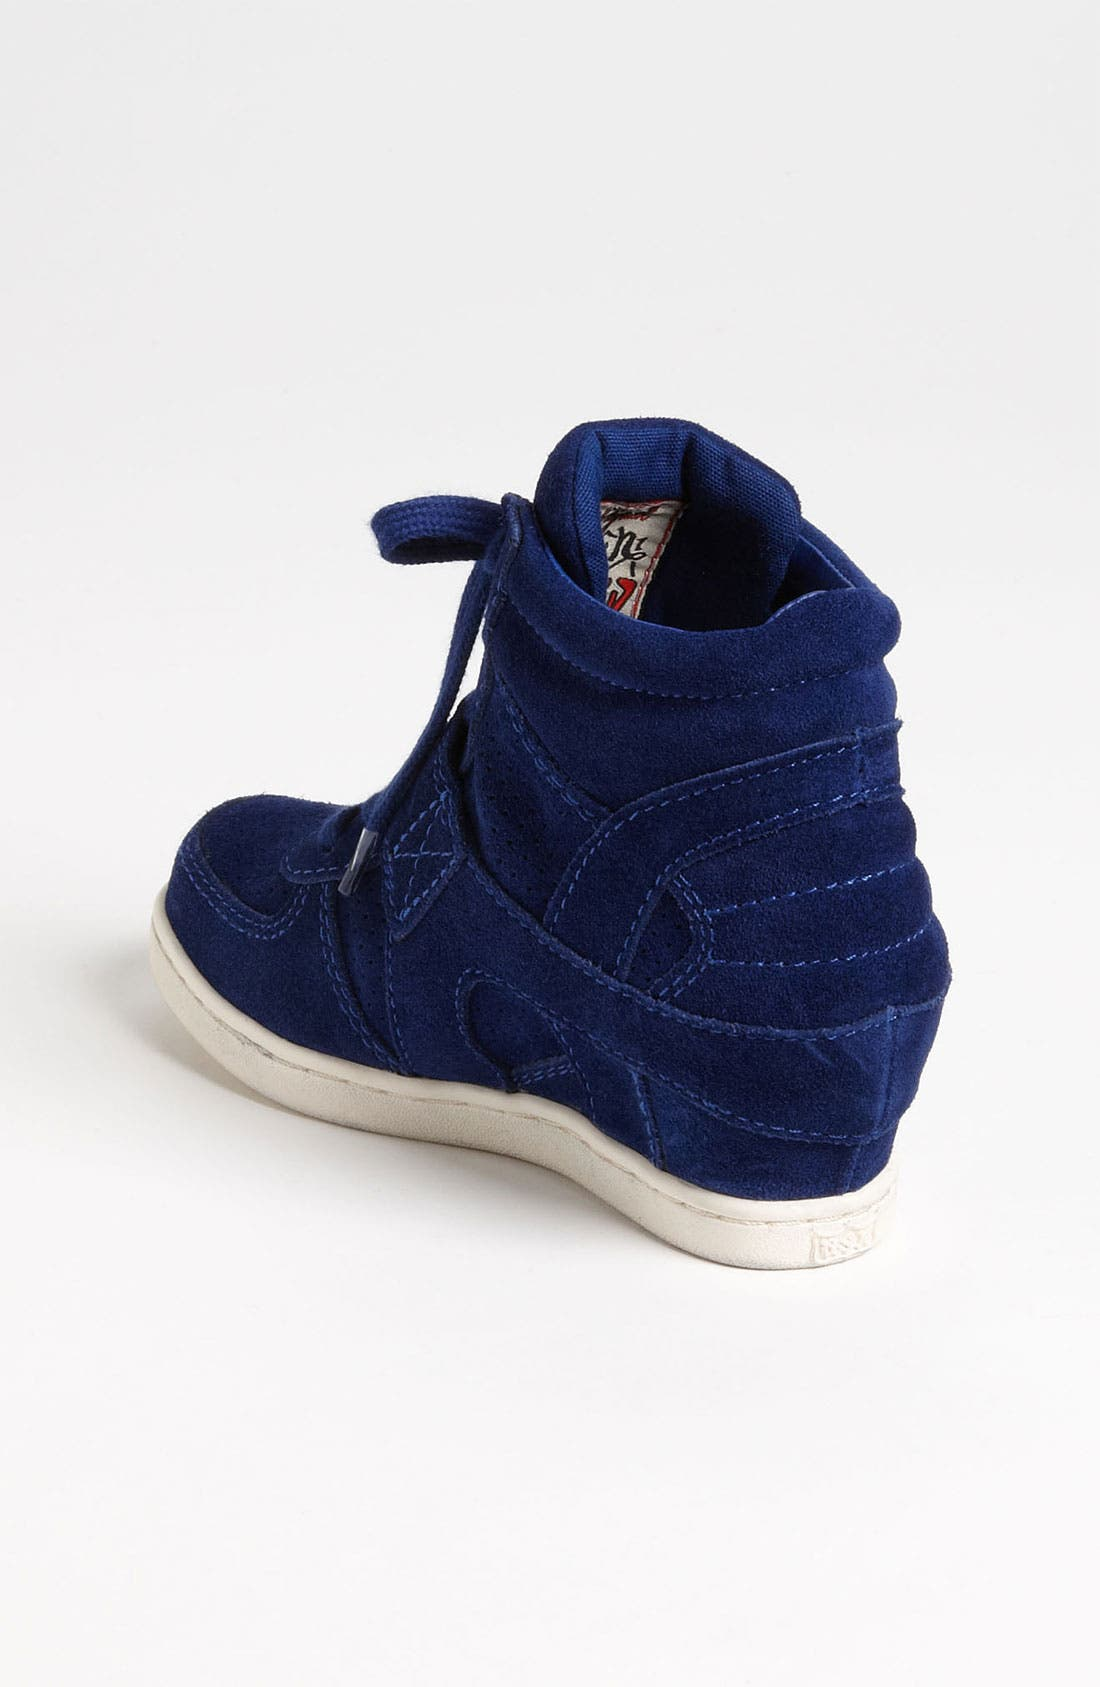 Alternate Image 2  - Ash 'Babe' Sneaker (Toddler, Little Kid & Big Kid)